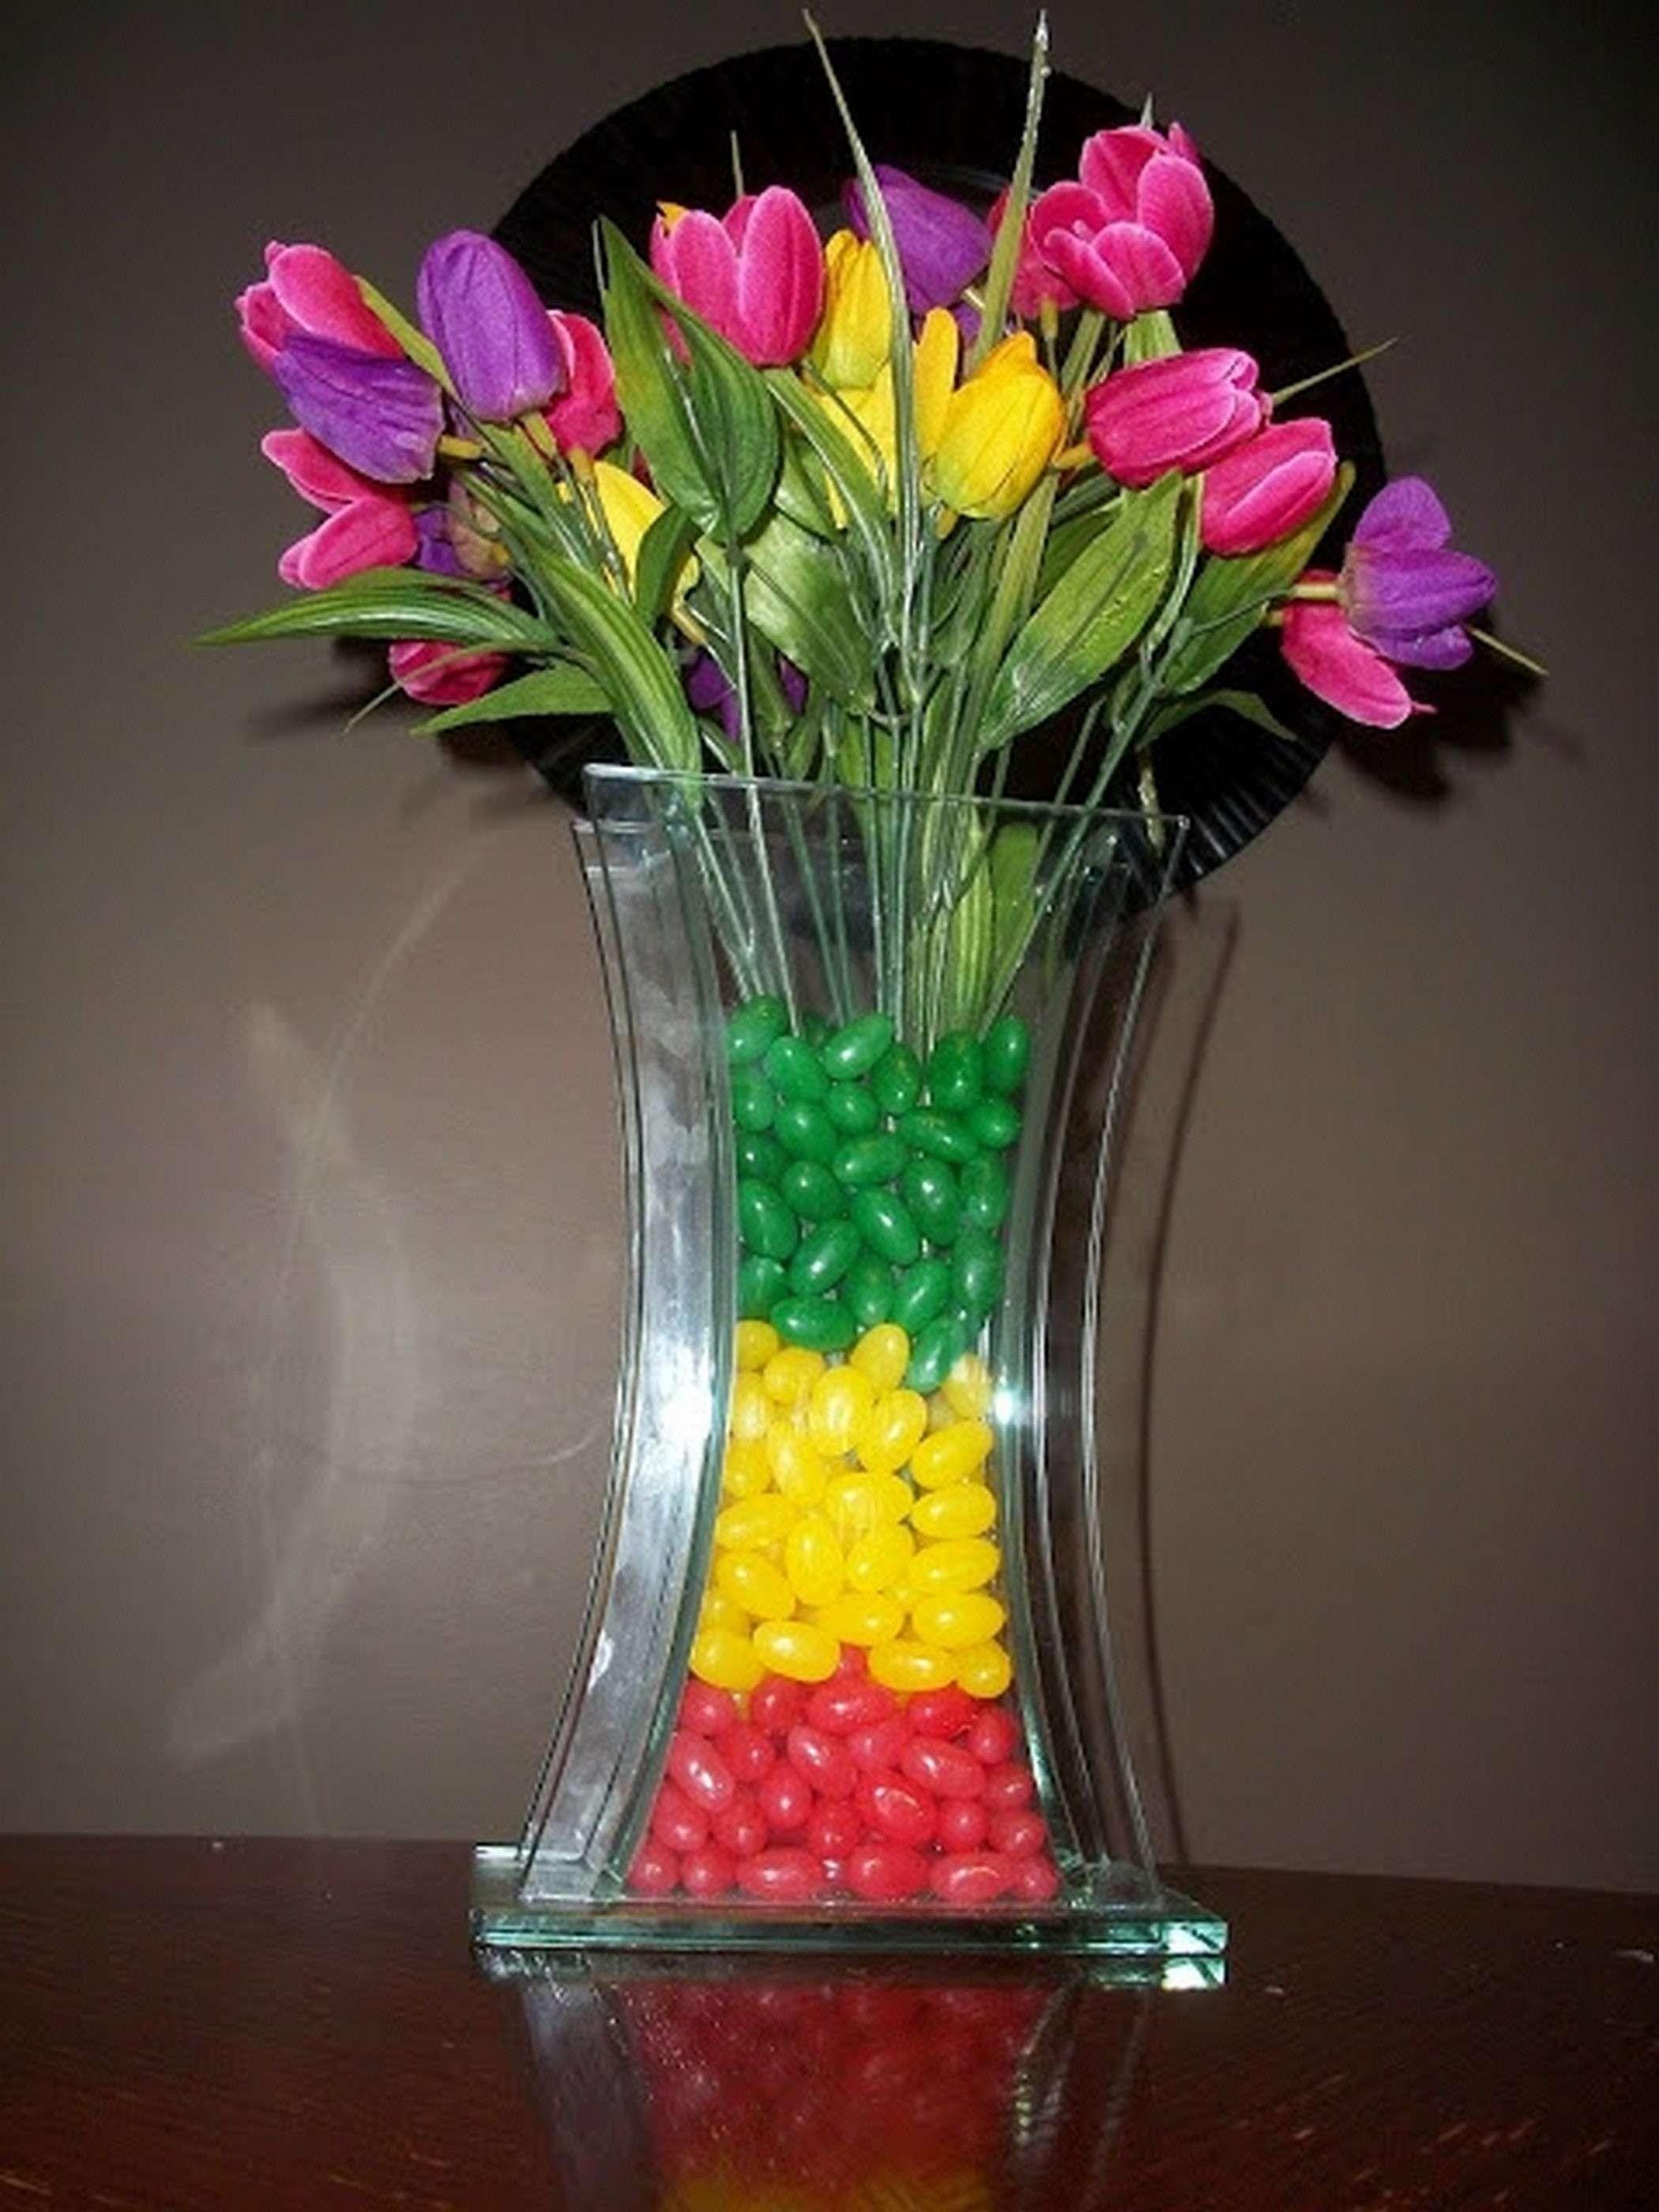 centerpiece plastic vases of 15 cheap and easy diy vase filler ideas 3h vases flower i 0d scheme with regard to 15 cheap and easy diy vase filler ideas 3h vases flower i 0d scheme